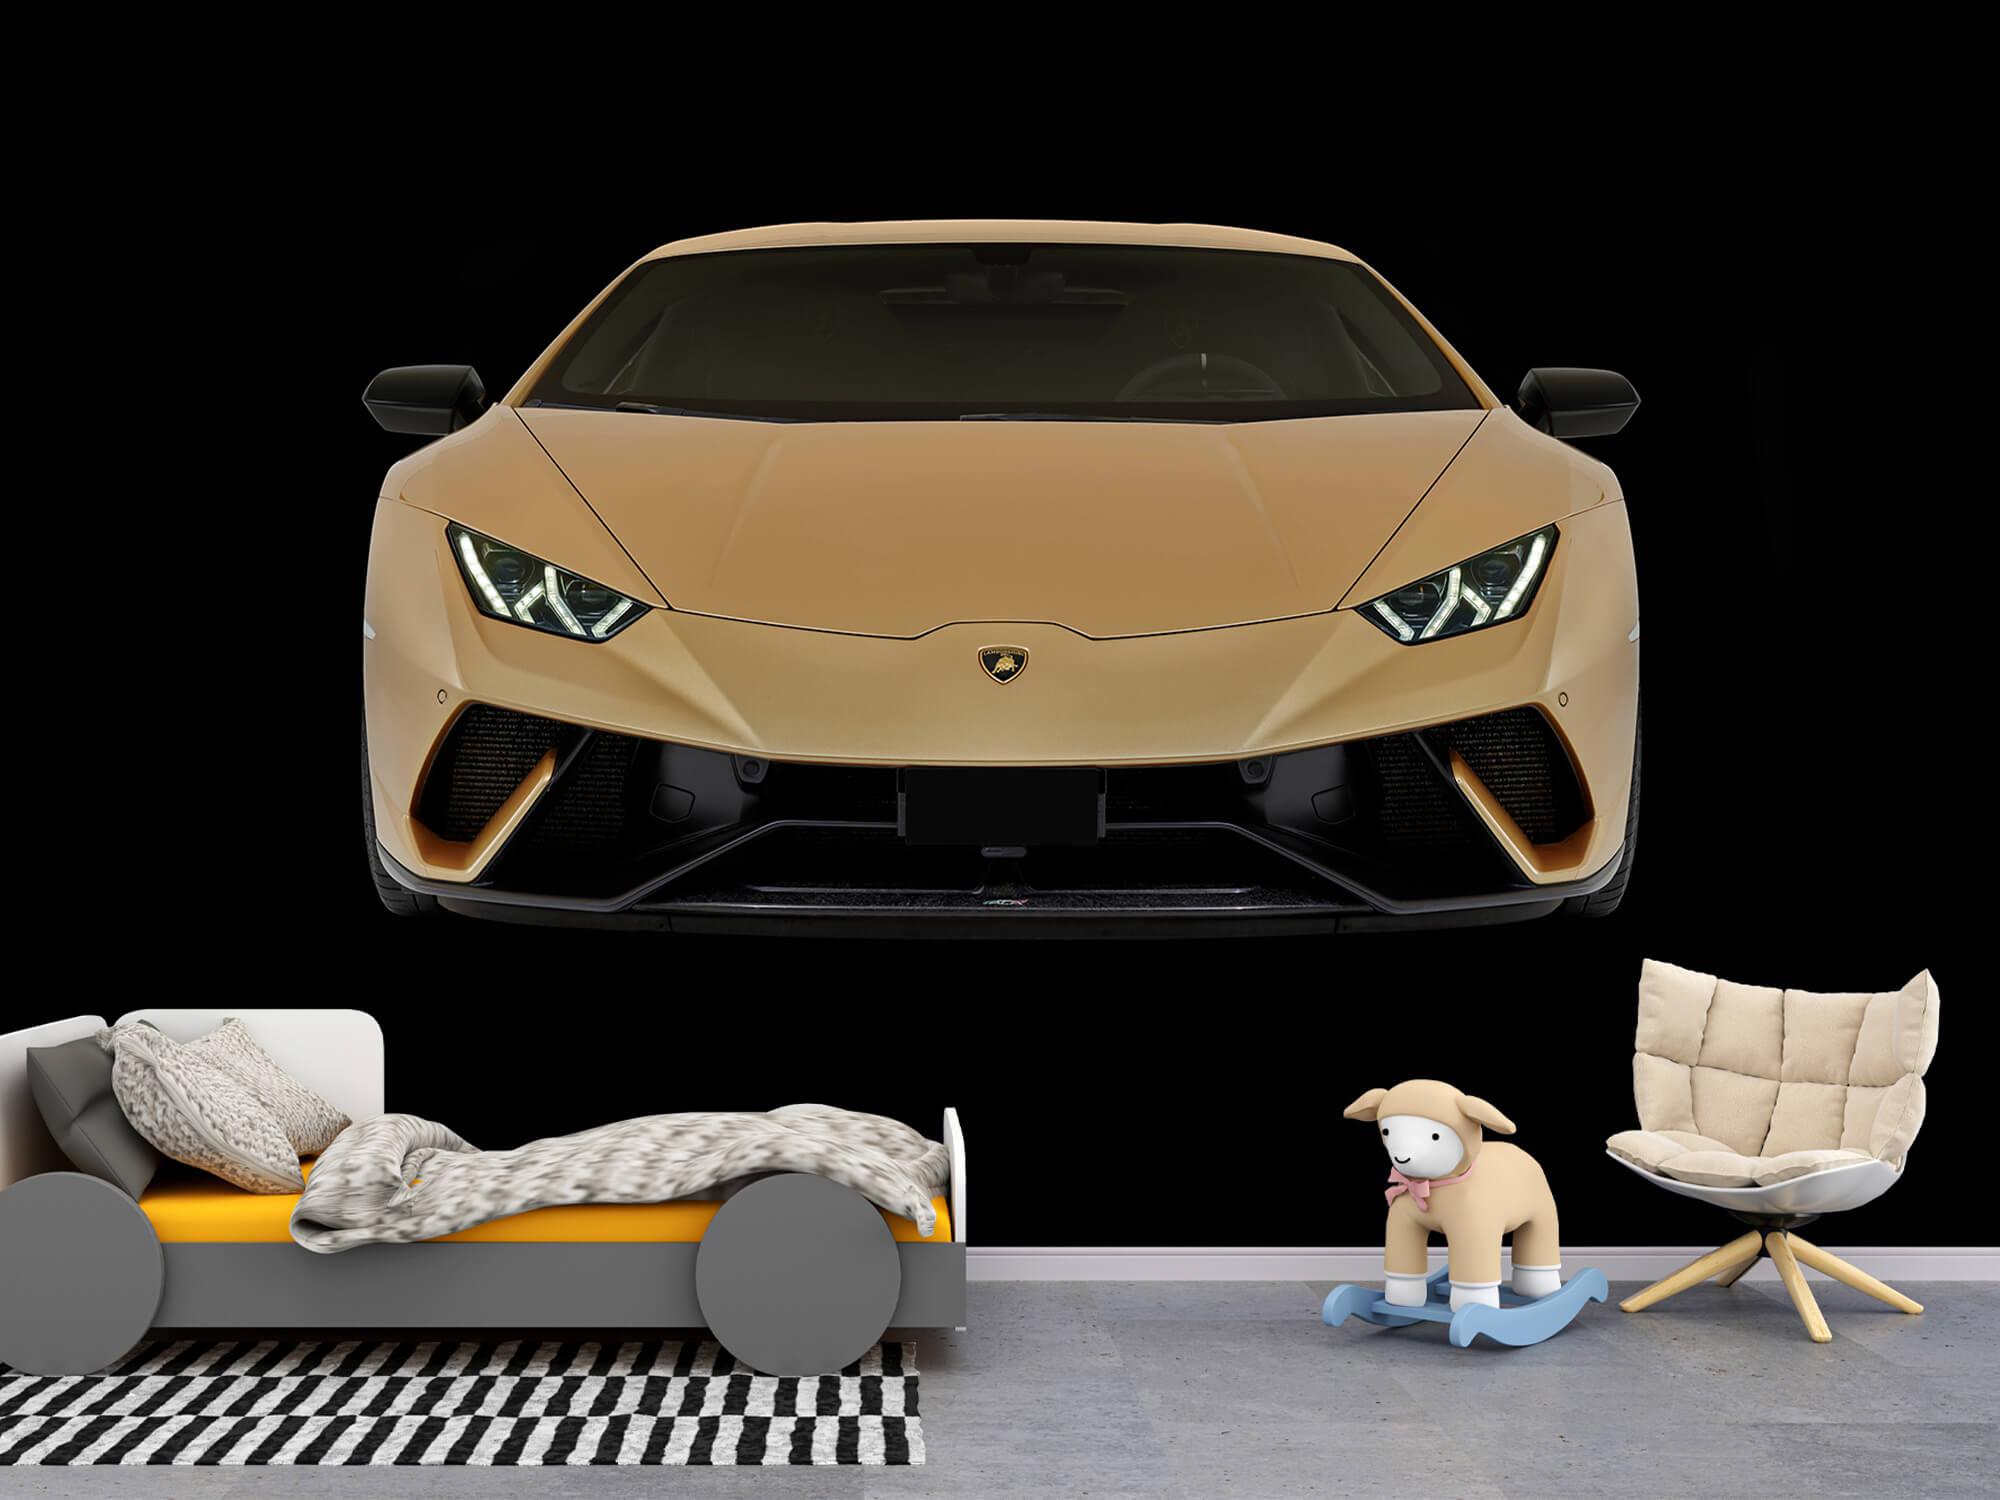 Wallpaper Lamborghini Huracán - Voorkant, zwart 9